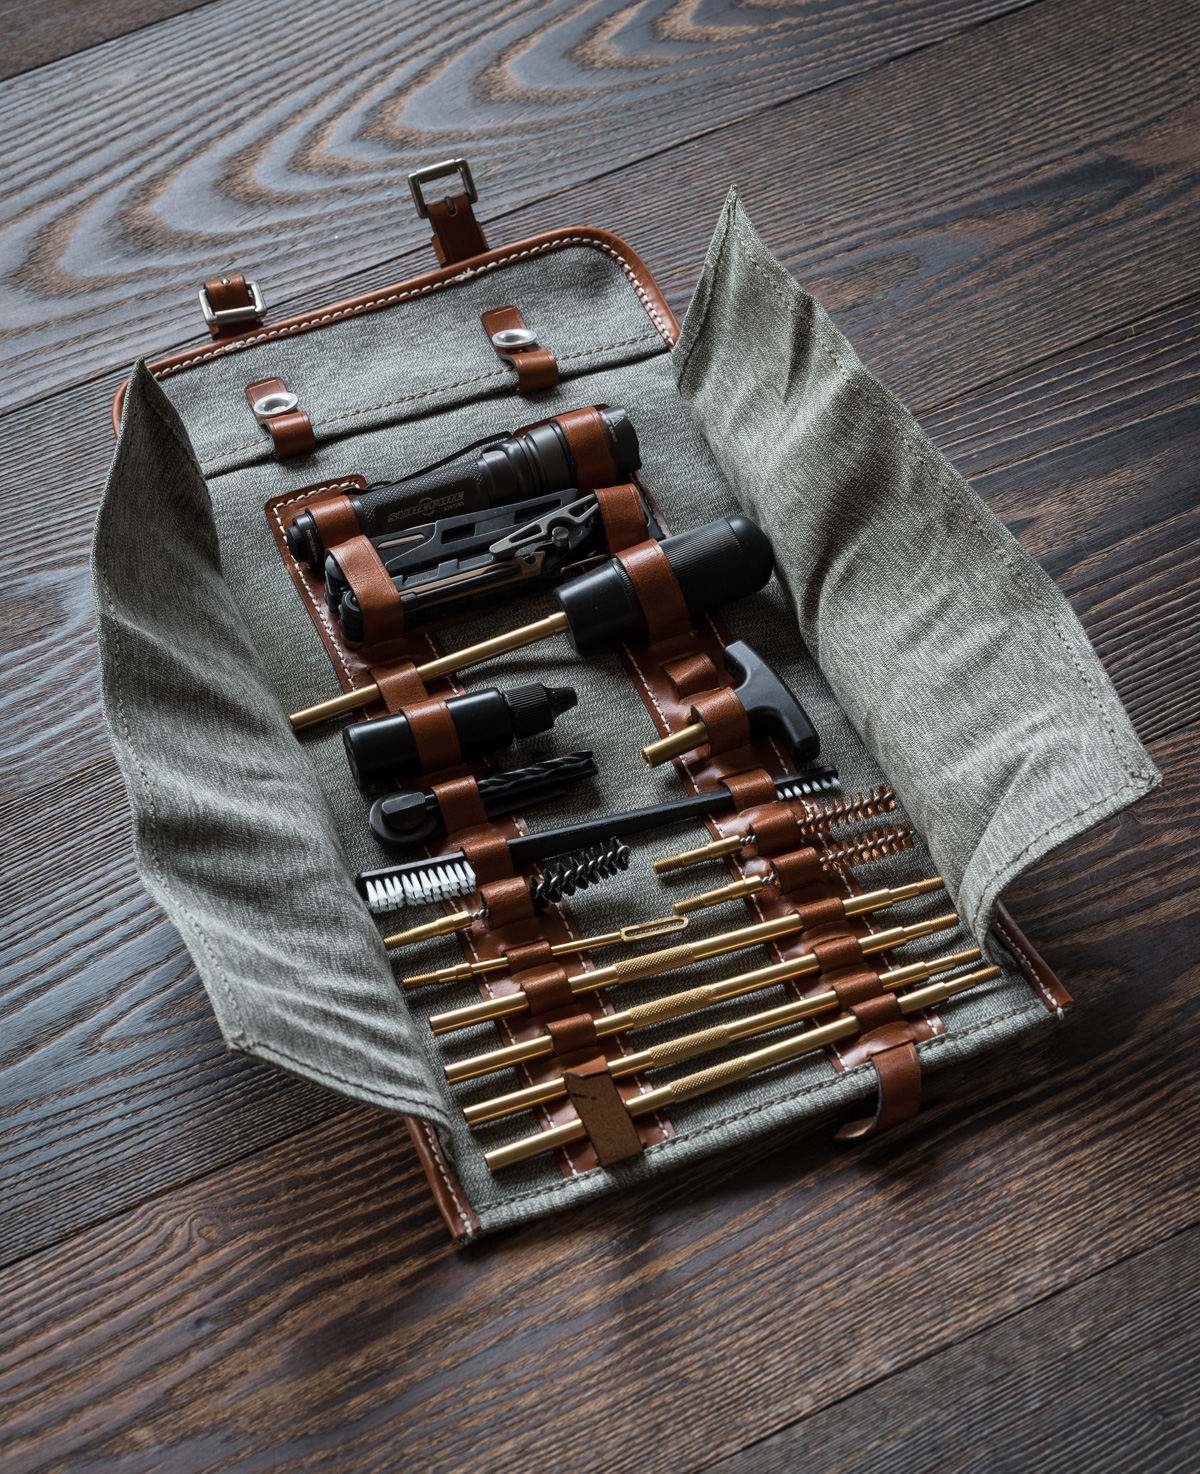 Tool Roll & Bag (6 of 13)